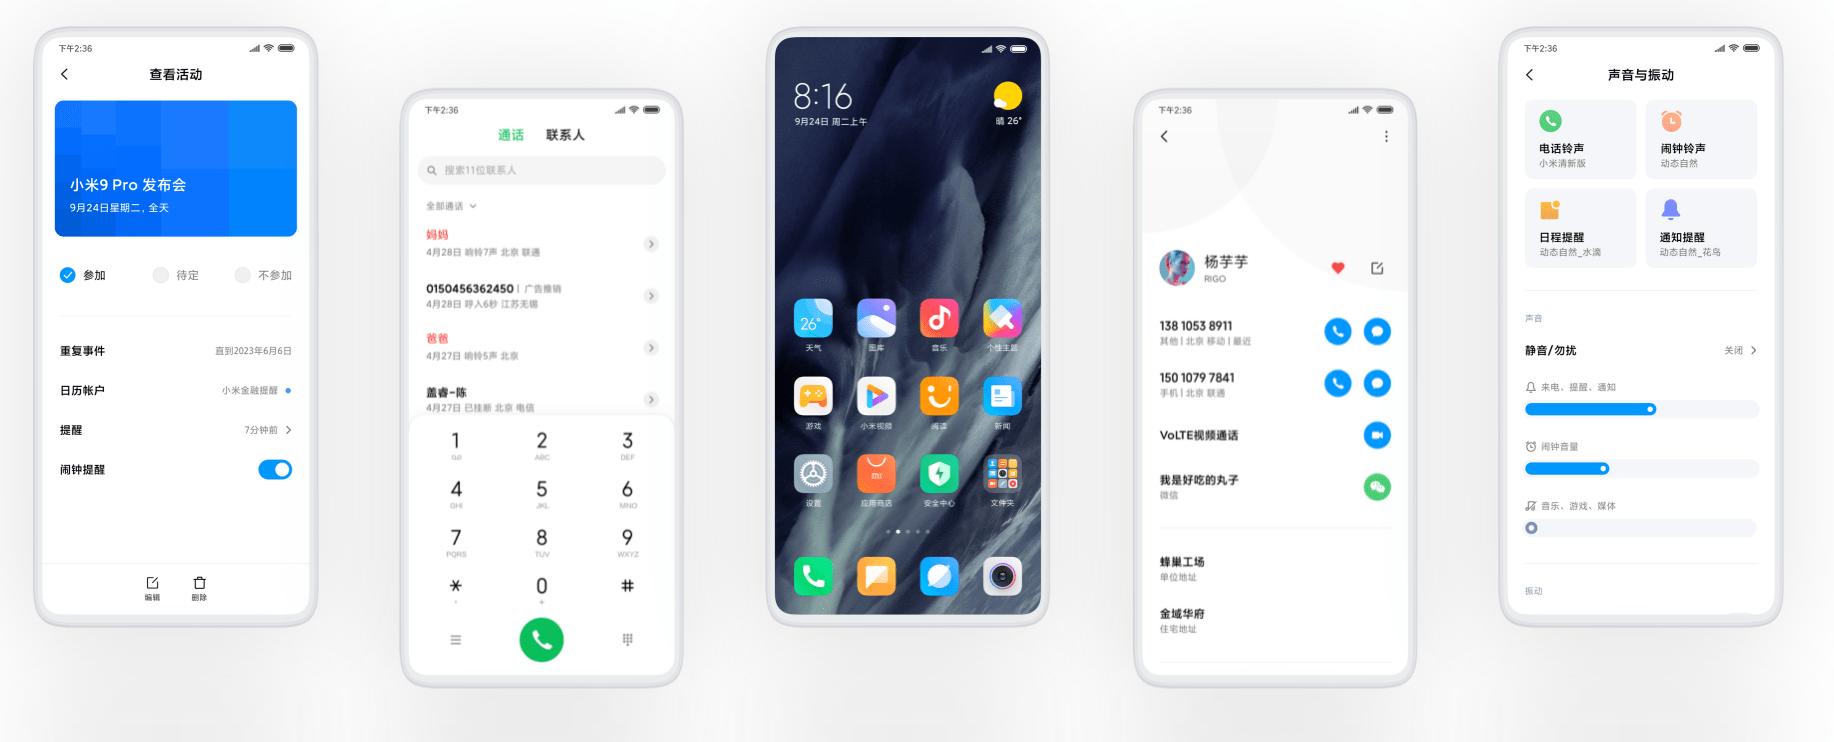 MIUI 11 : Xiaomi annonce une sortie le 16 octobre